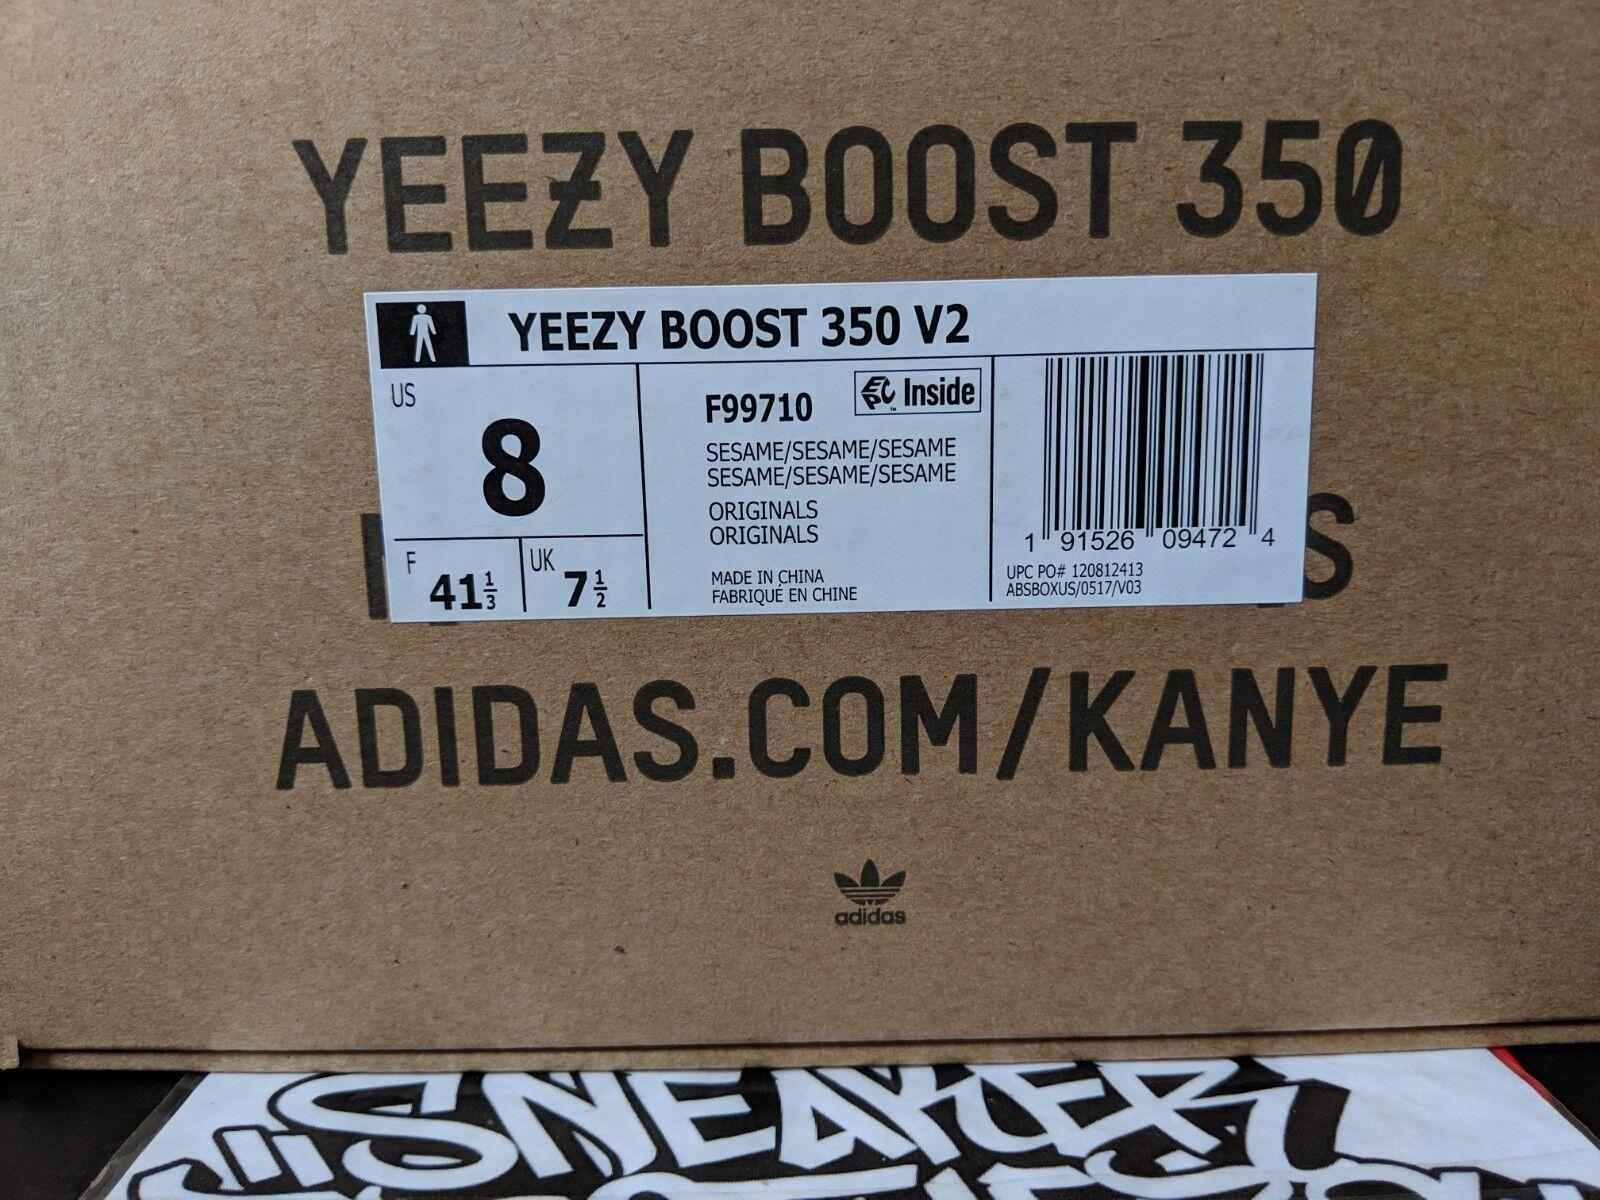 Adidas yeezy impulso 350 v2 v2 v2 sesame kanye west, fede f99710   Diversificate Nella Confezione    Scolaro/Ragazze Scarpa  0ba514